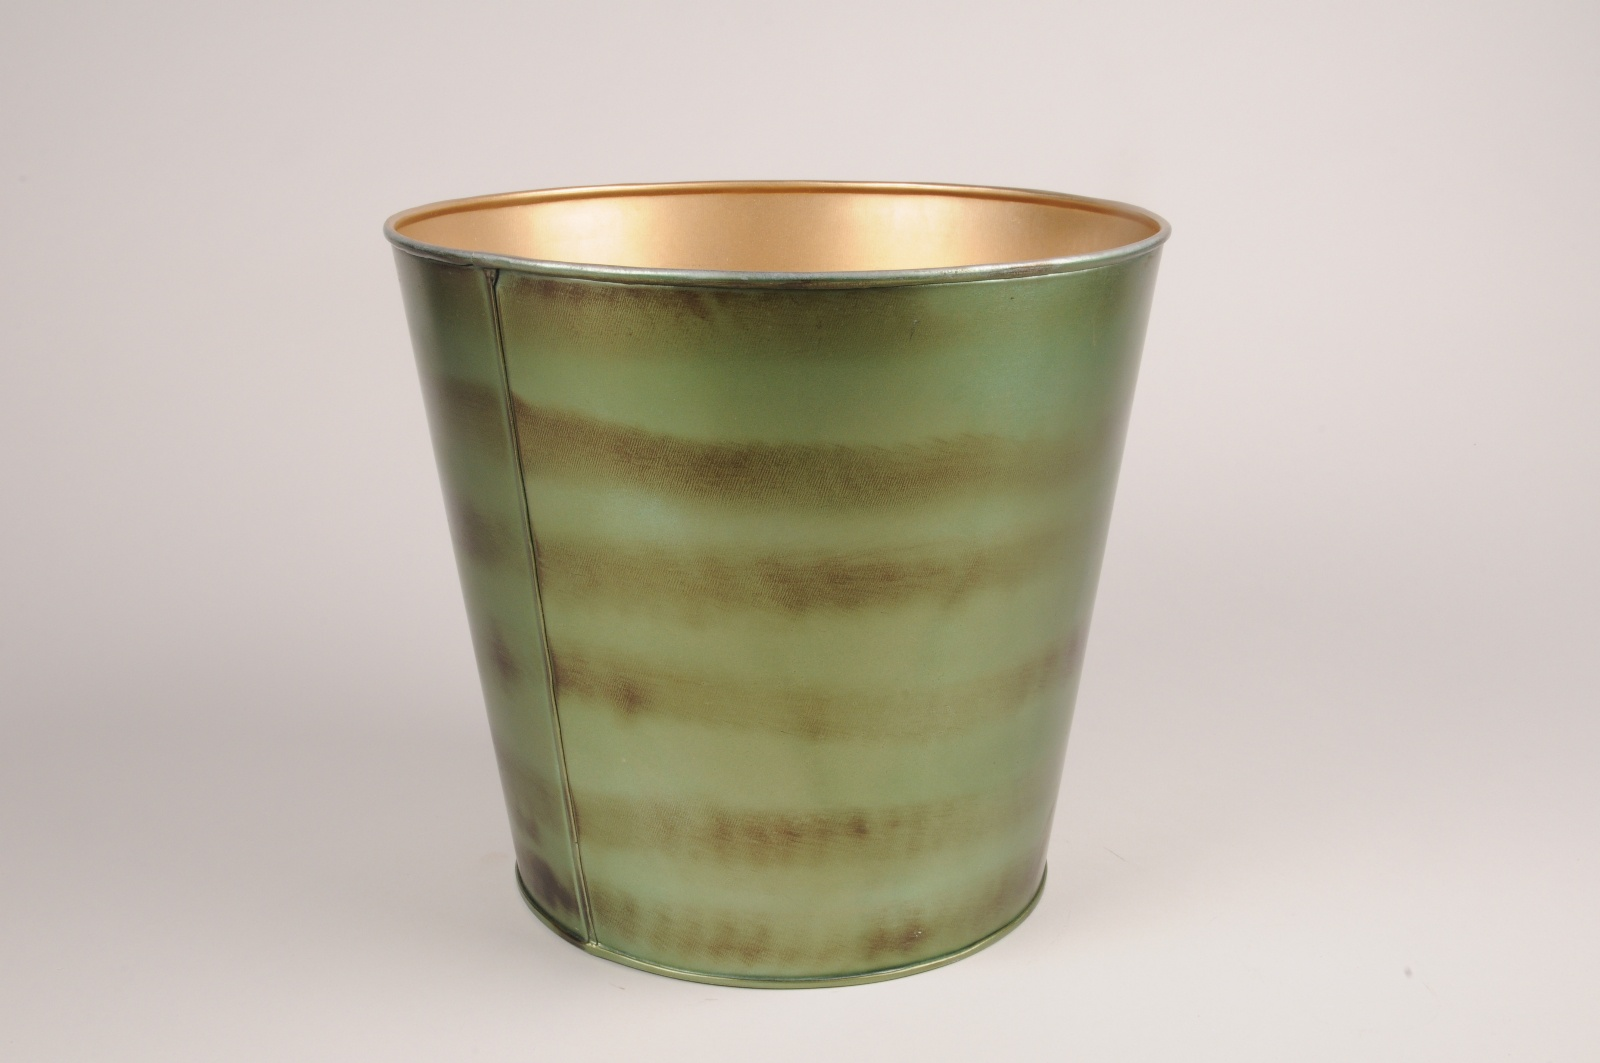 A066JY Cache-pot en métal vert D18cm H17cm